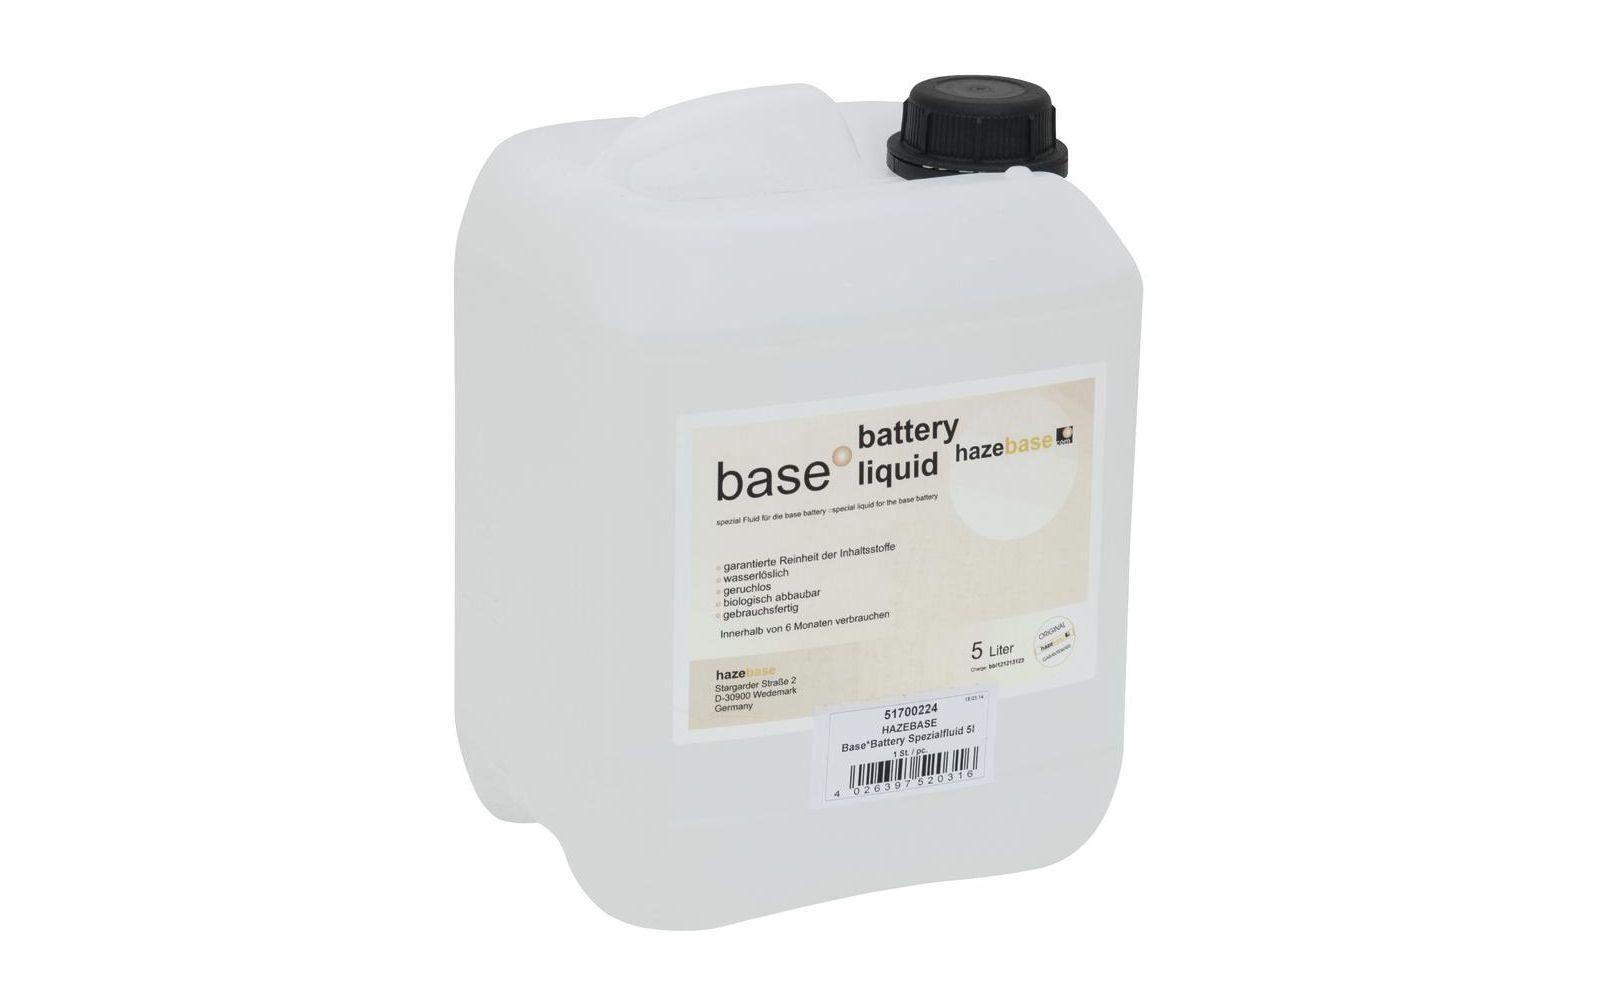 hazebase-base-battery-spezialfluid-5l-kanister